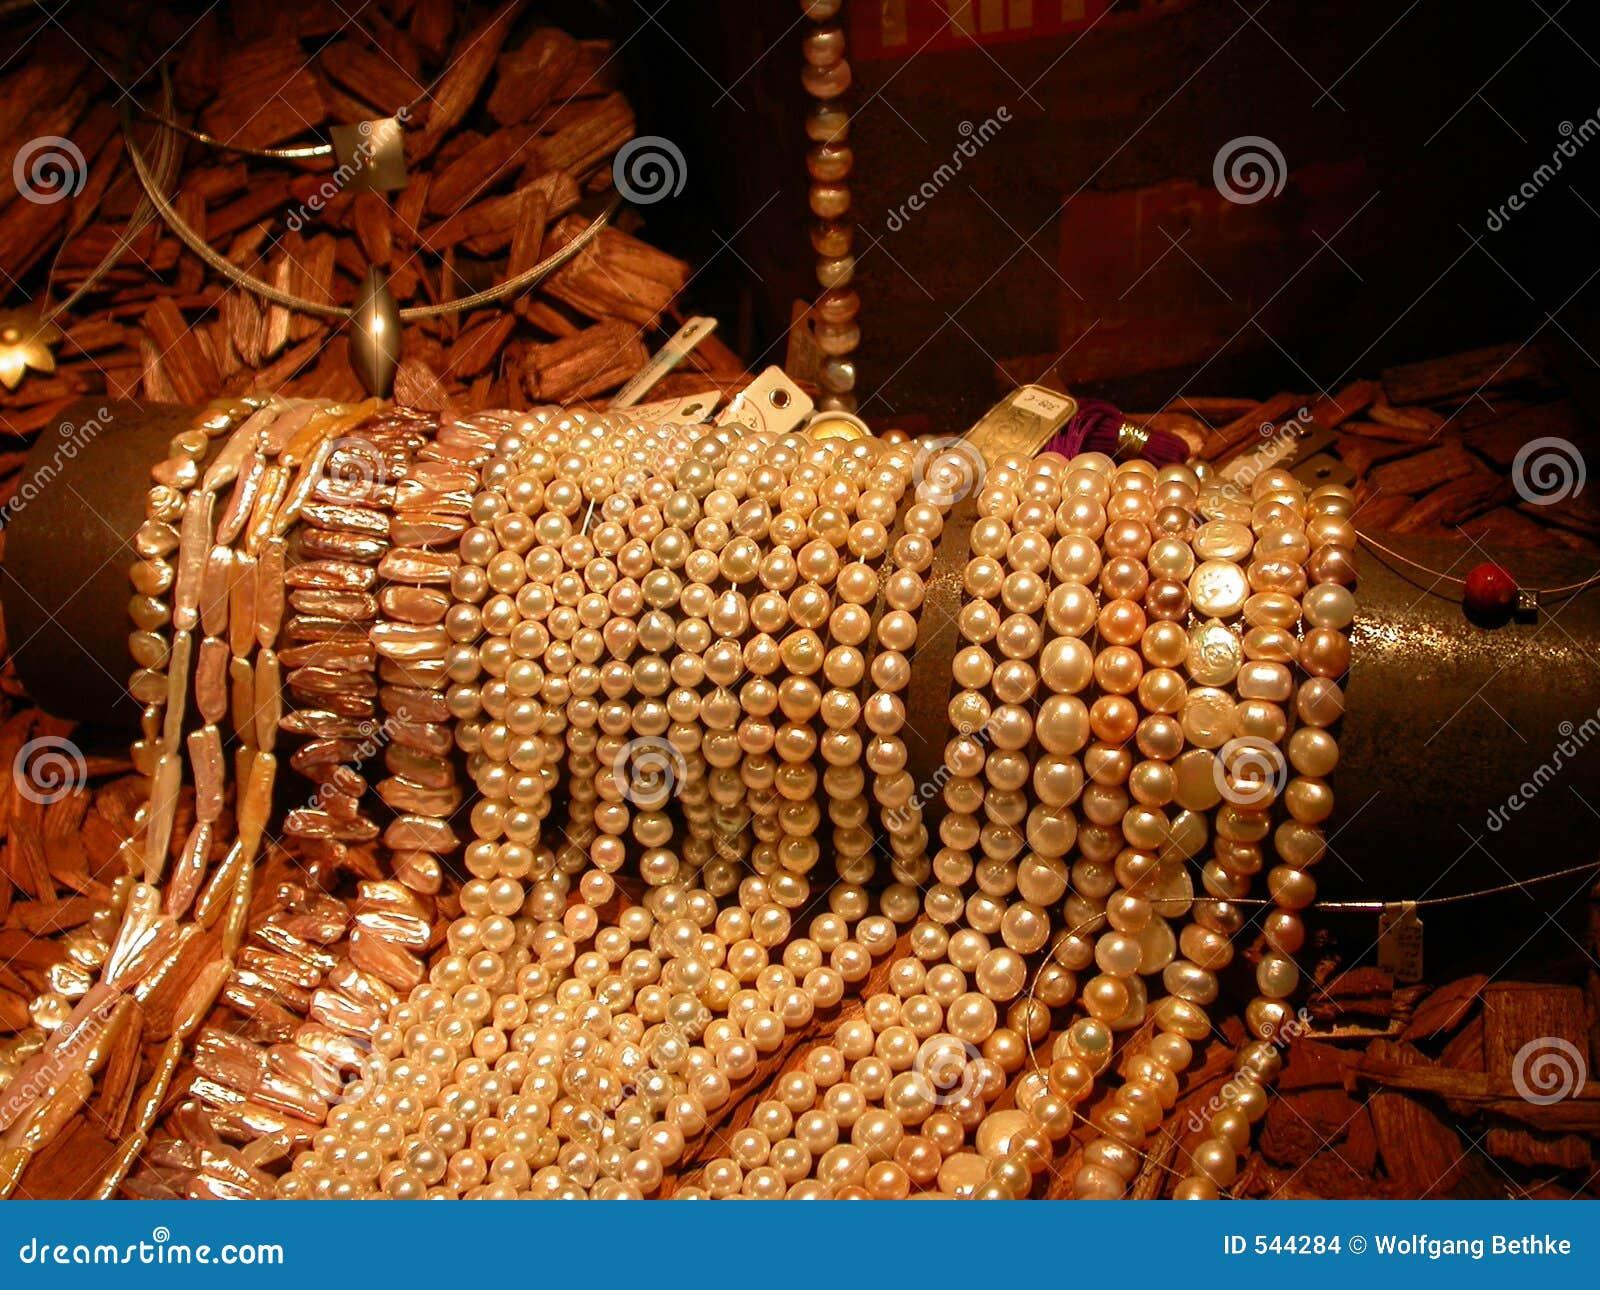 Download 珍珠 库存照片. 图片 包括有 富有, 资产, 珍宝, 存在, äº, 装饰, 消耗大, 丰厚, 珠宝, browne - 544284